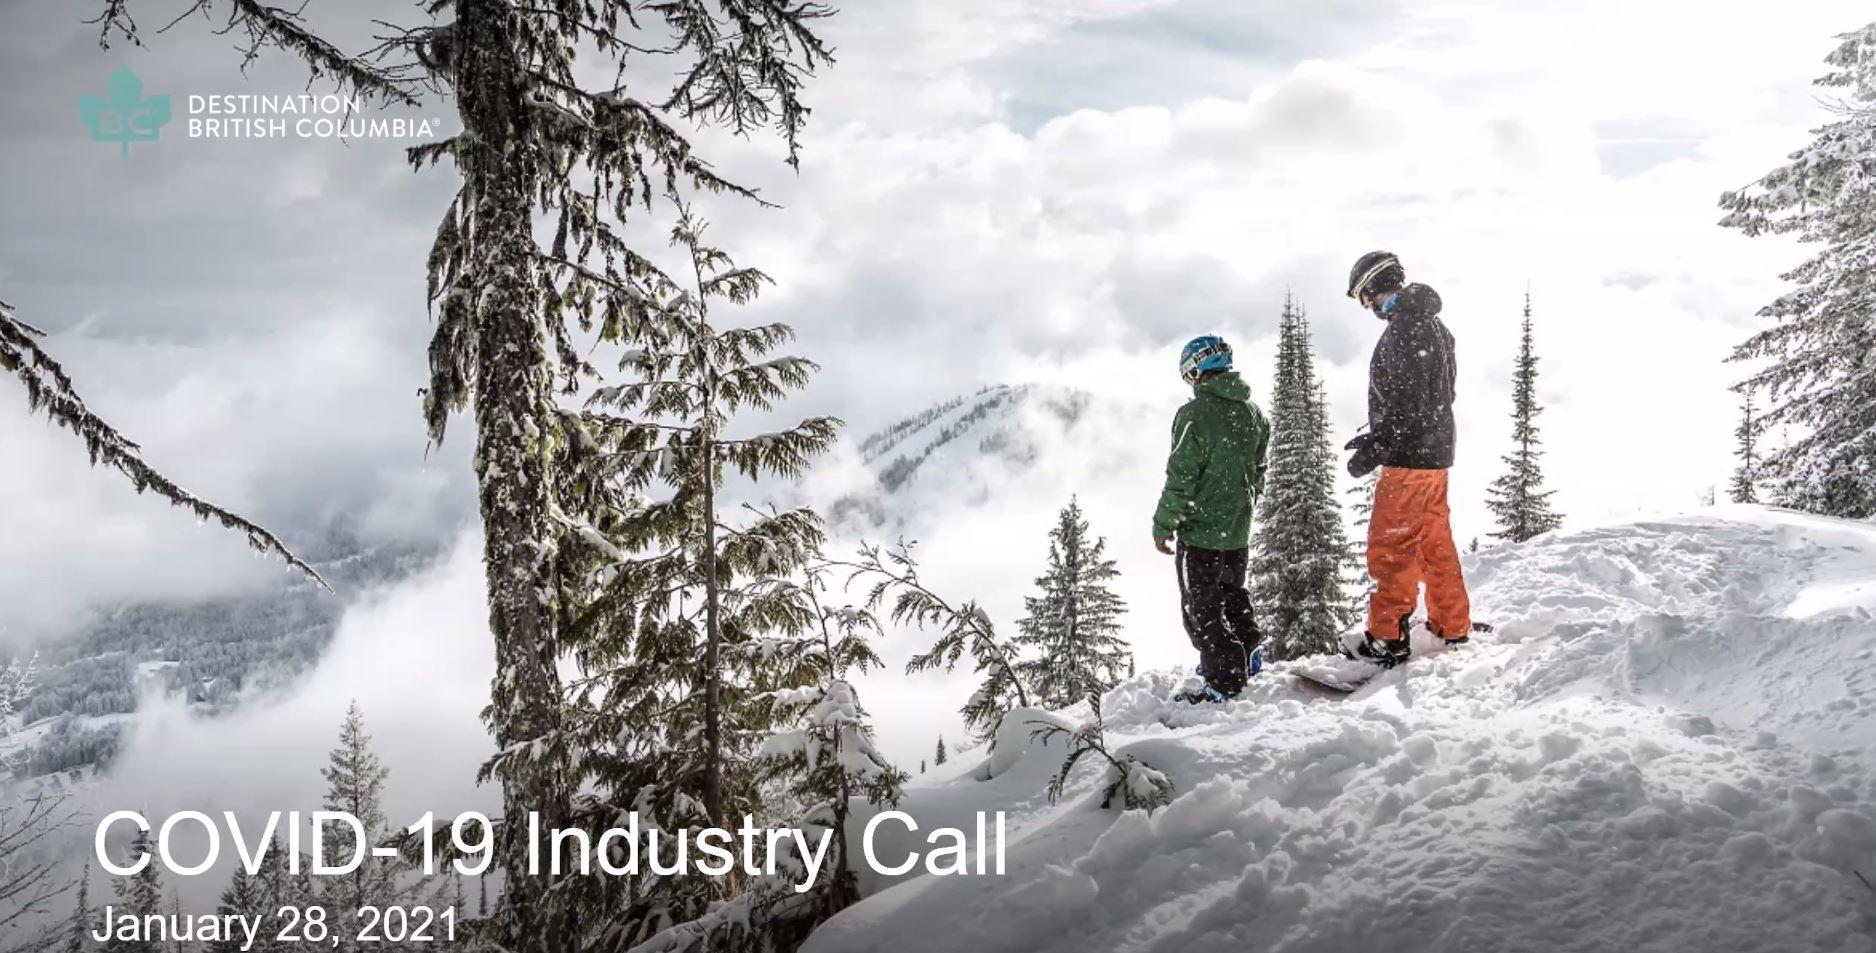 Industry Call: January 28, 2021